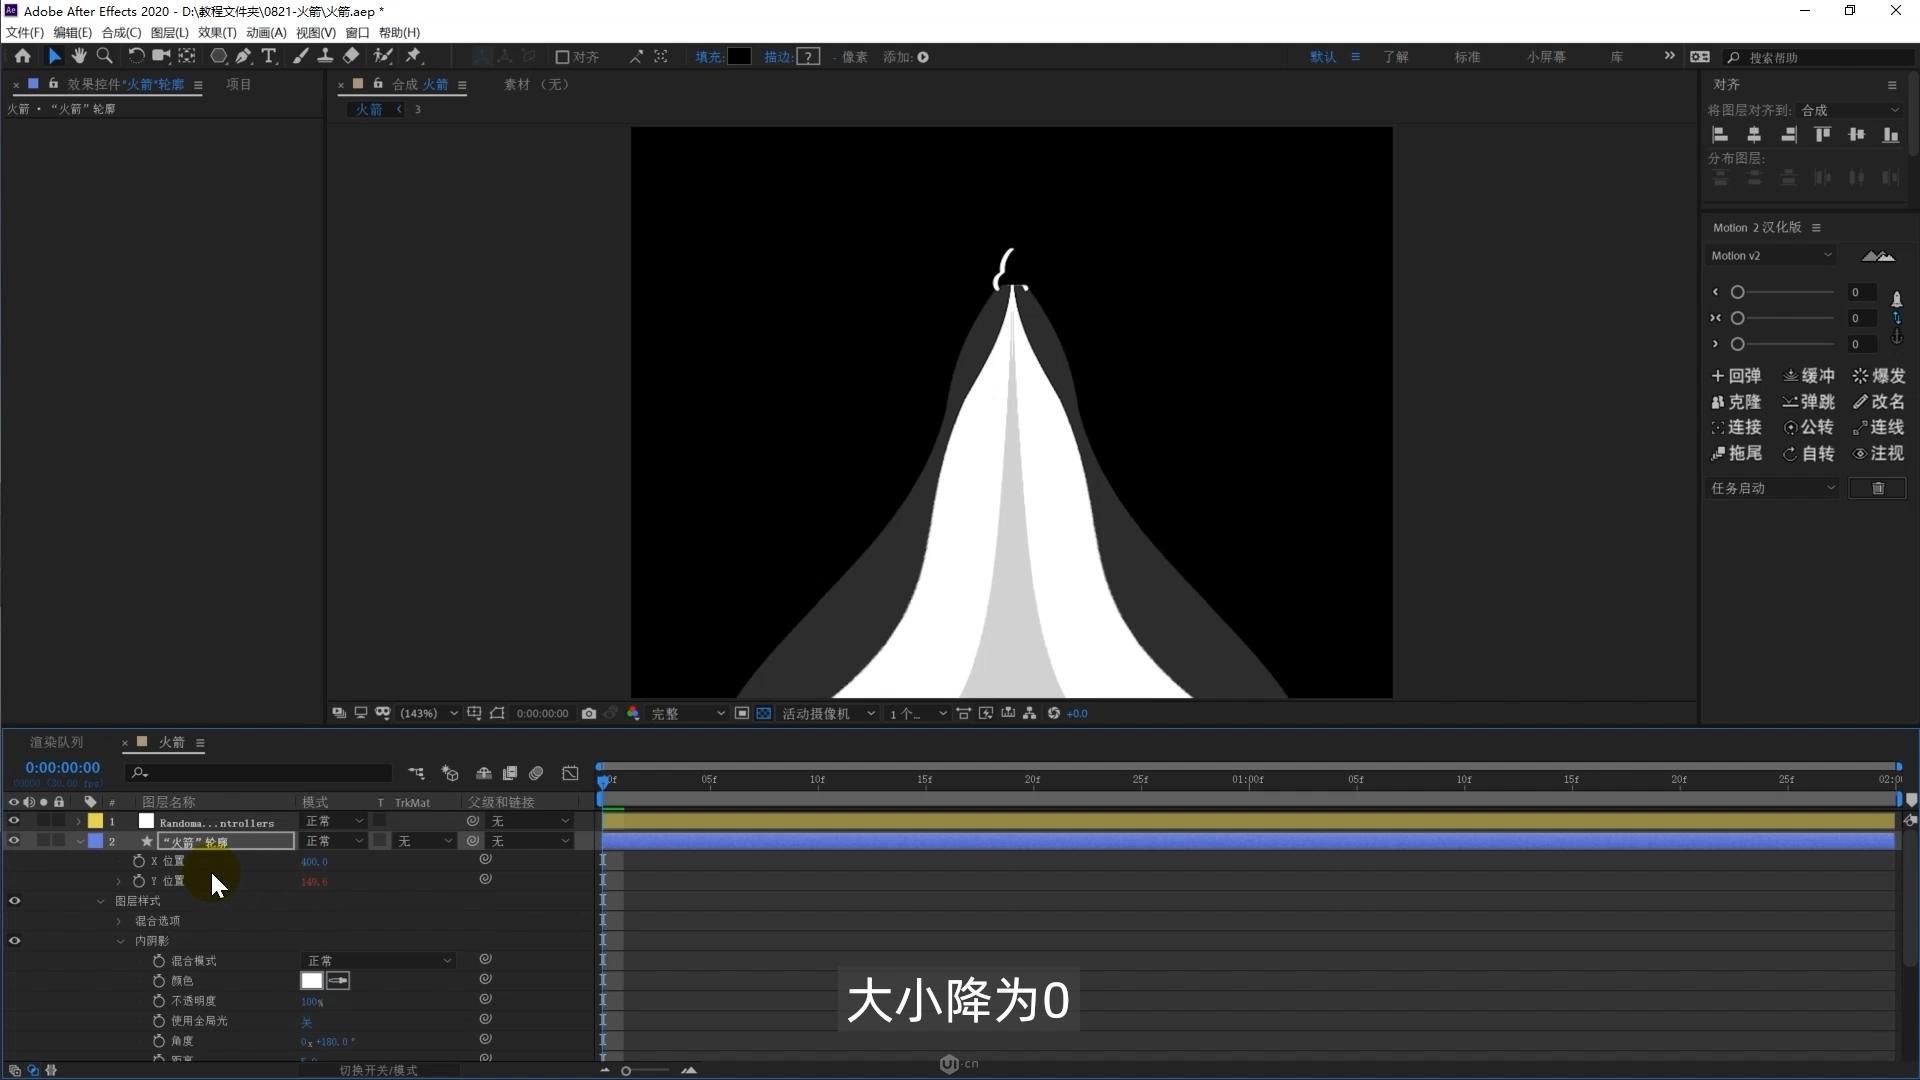 AE如何制作简单的太空旅行MG动画(11)